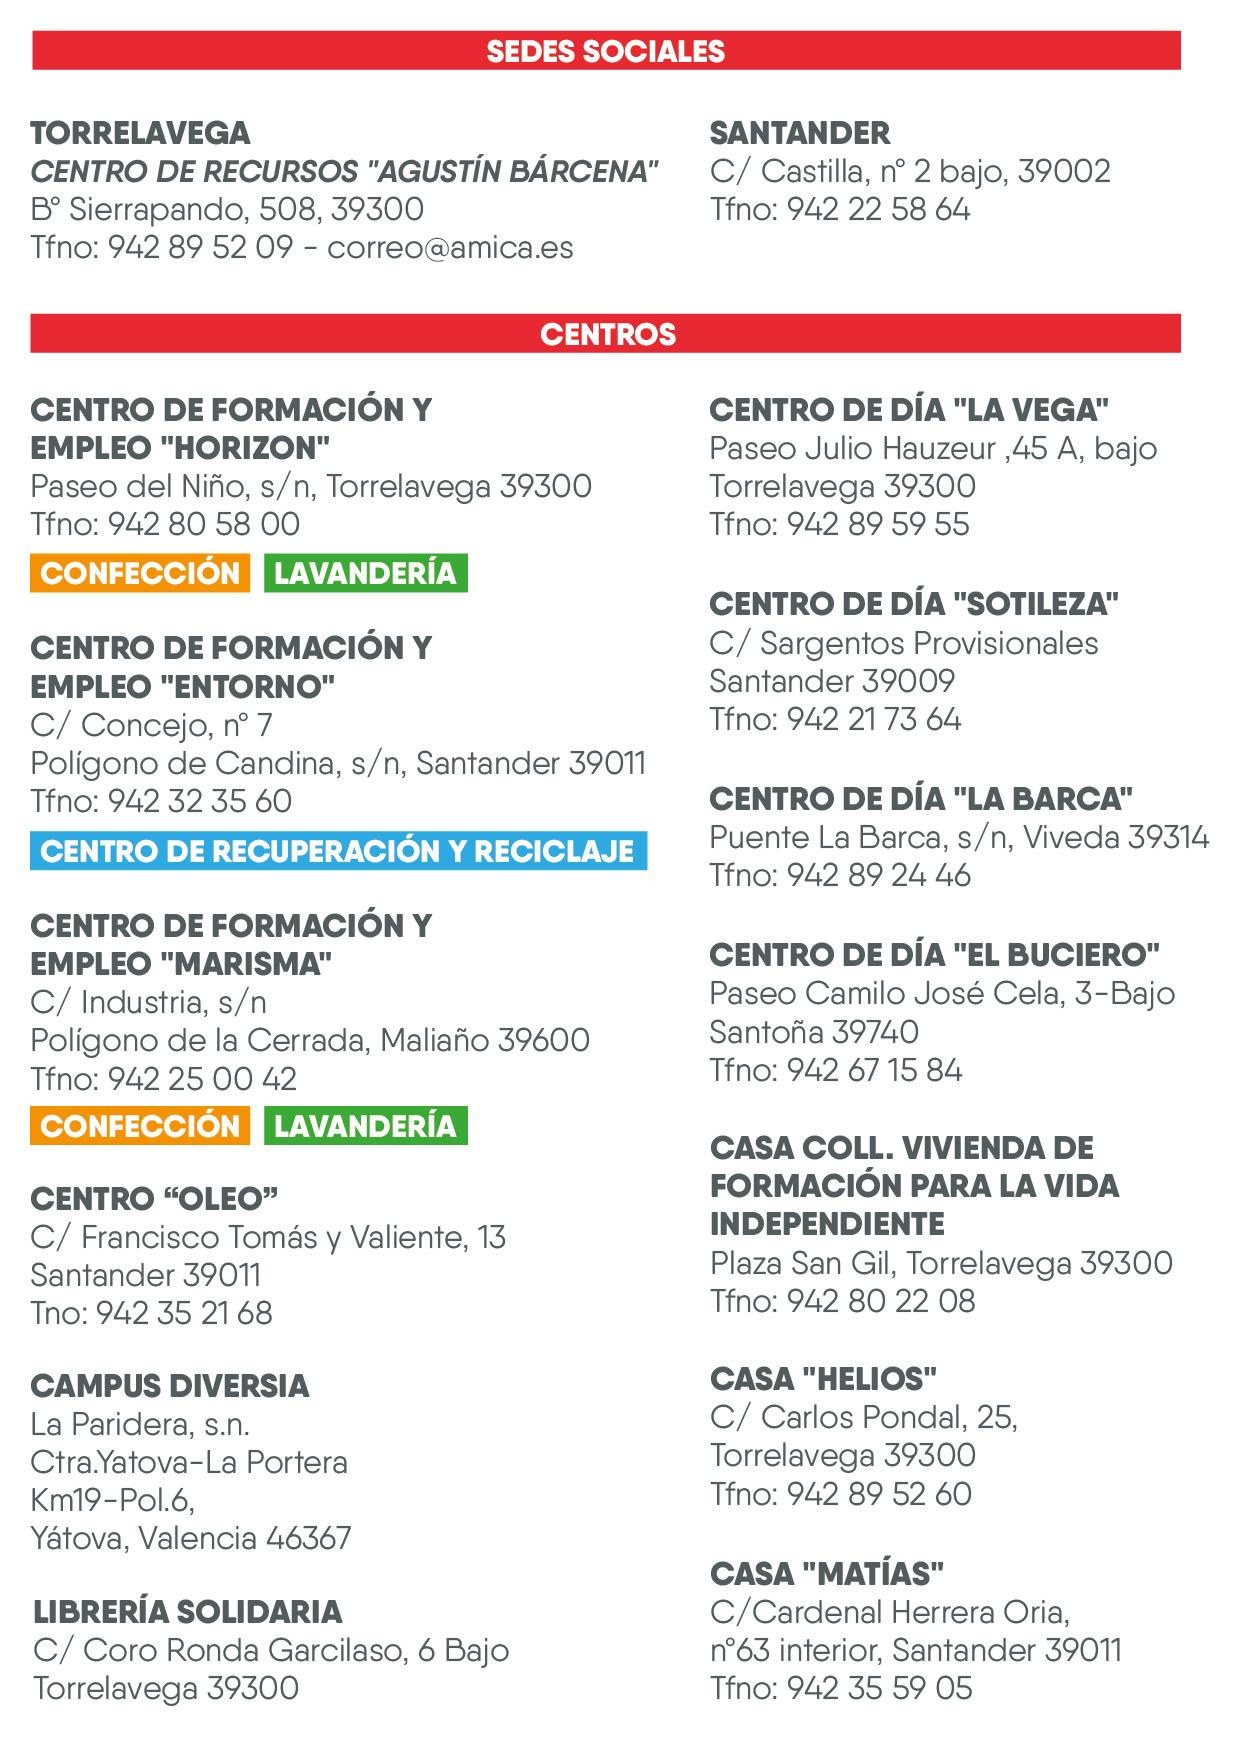 centros DE AMICA